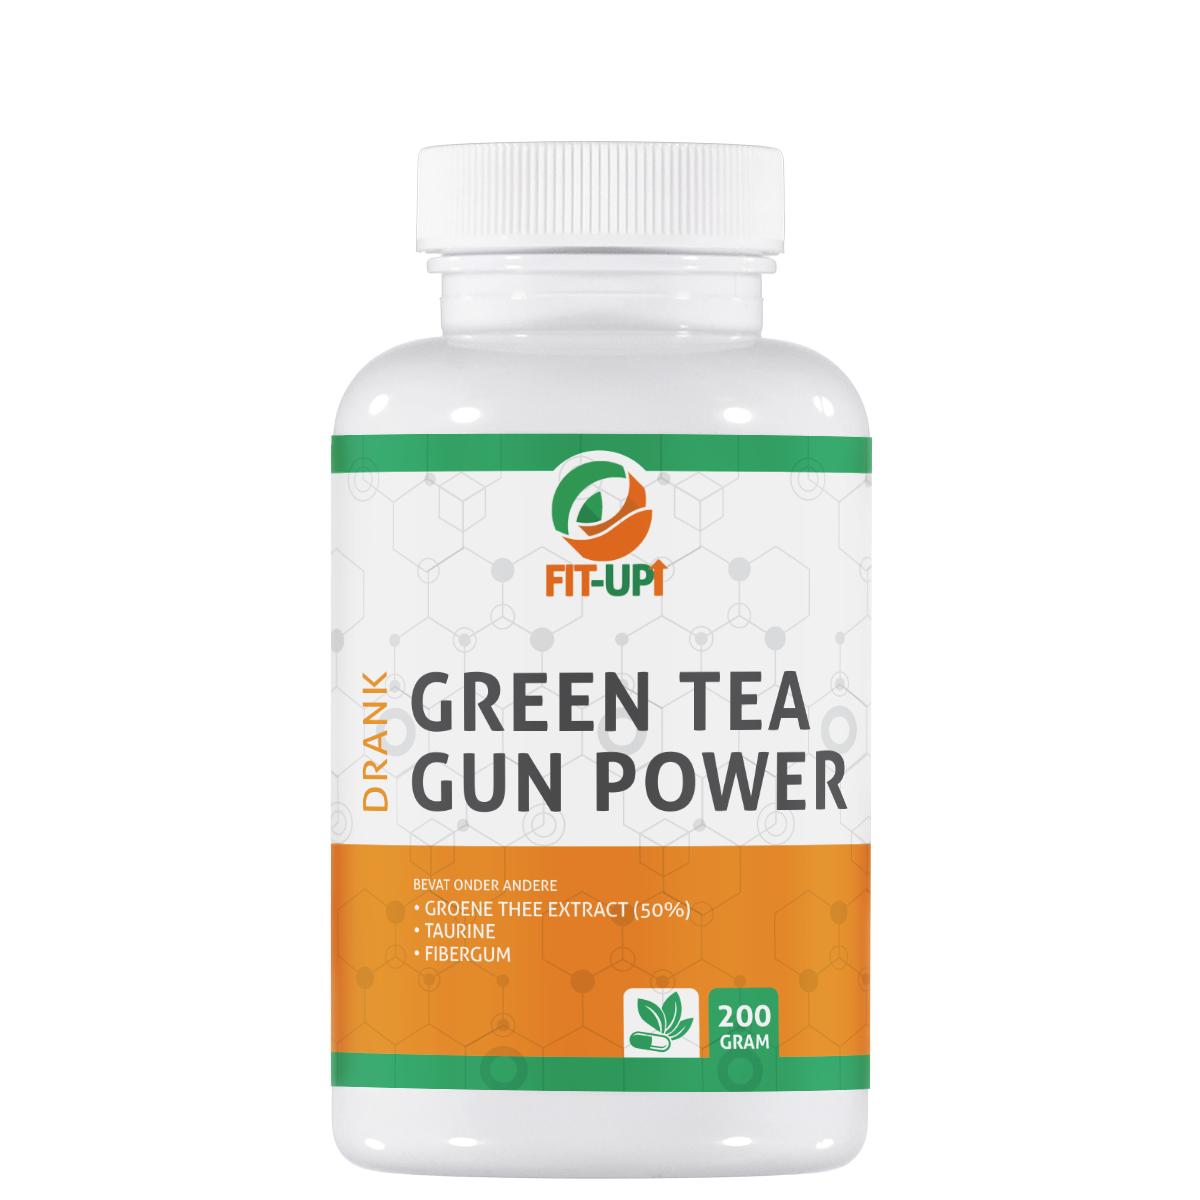 Green tea gun power - drank